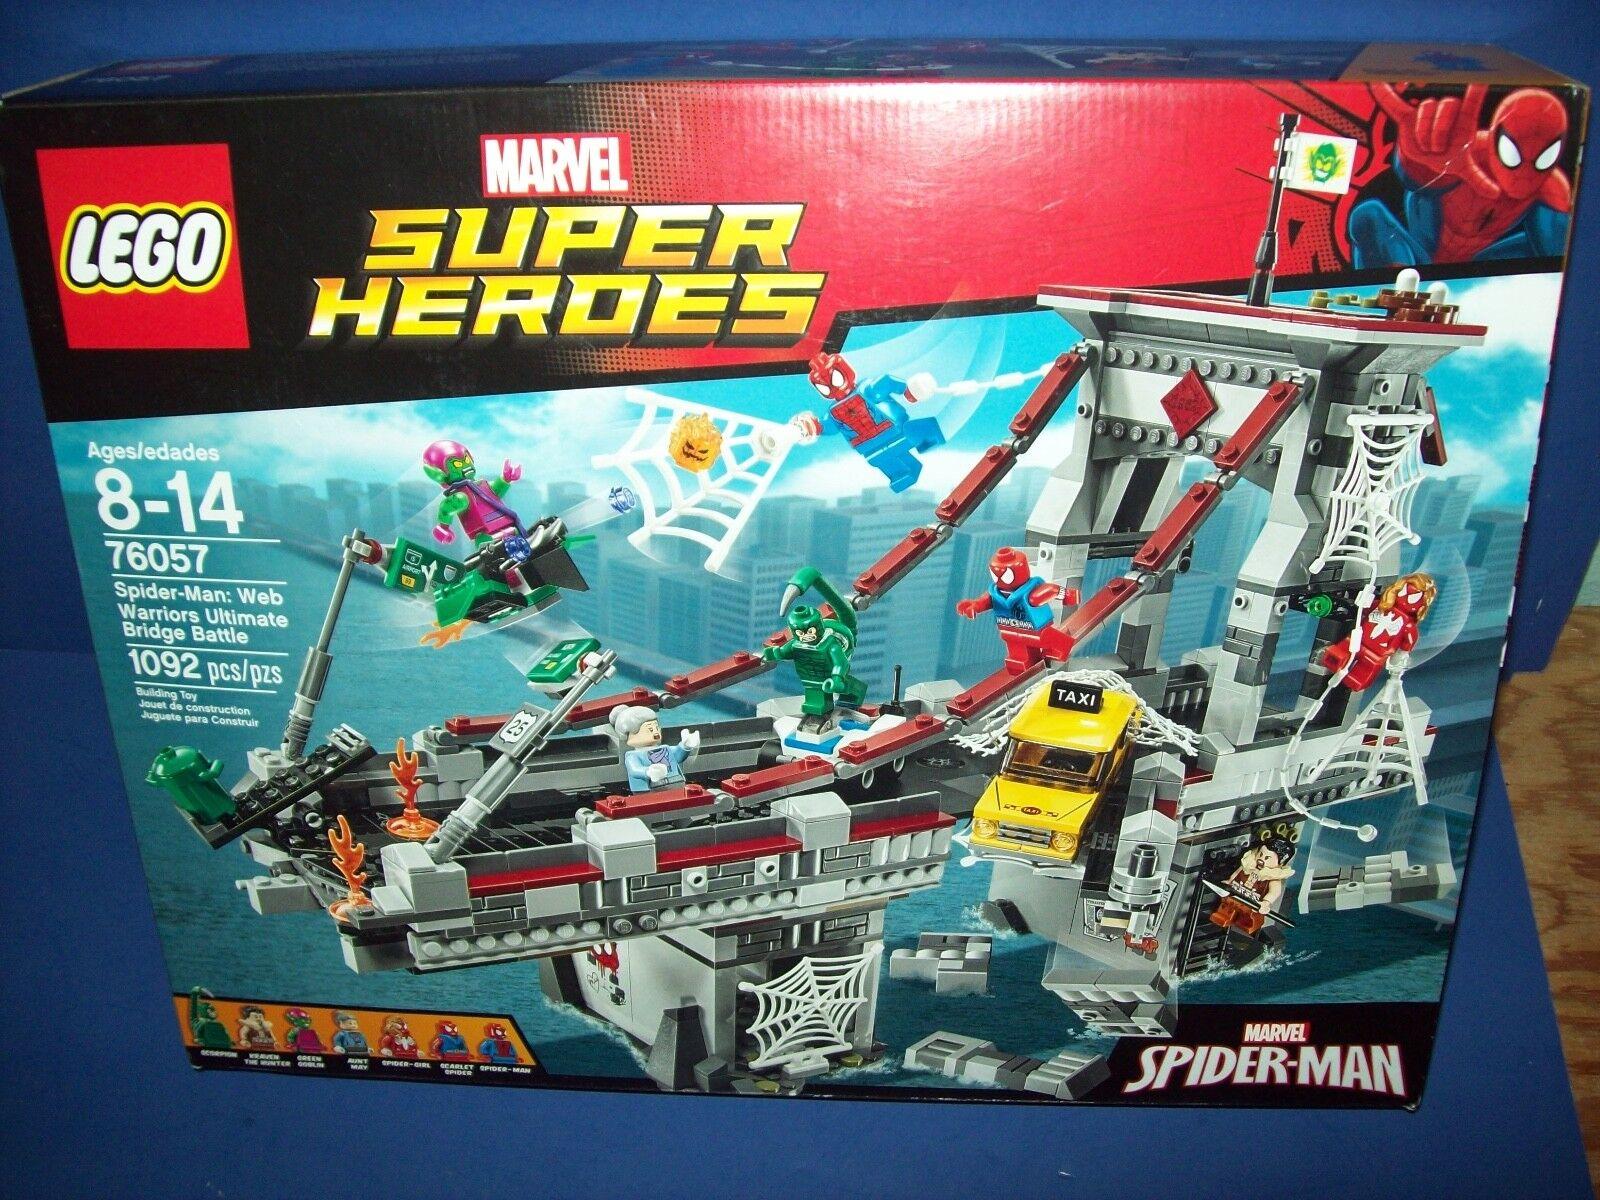 LEGO 76057 Marvel Super Heroes SPIDER-MAN WEB WARRIORS ULTIMATE BRIDGE BATTLE